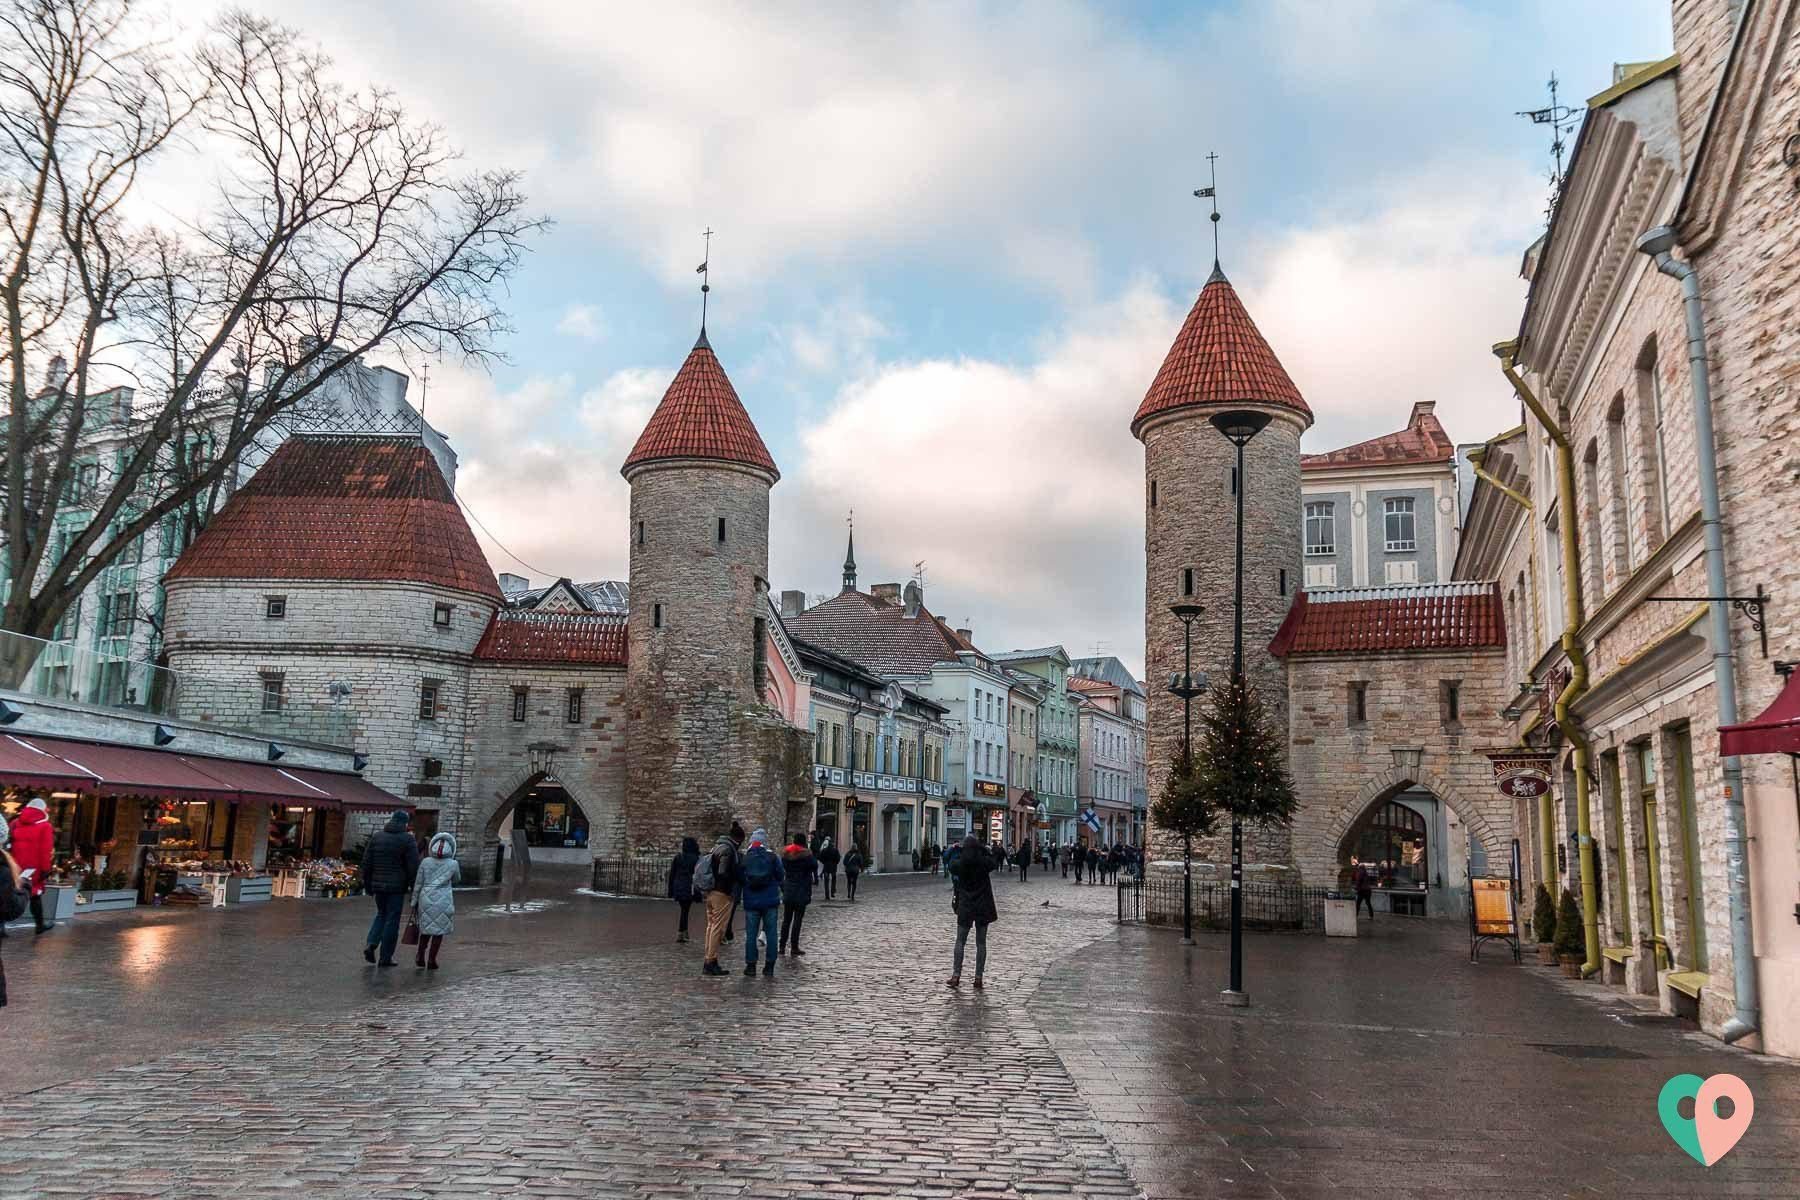 Das Viru-Tor in Tallinn